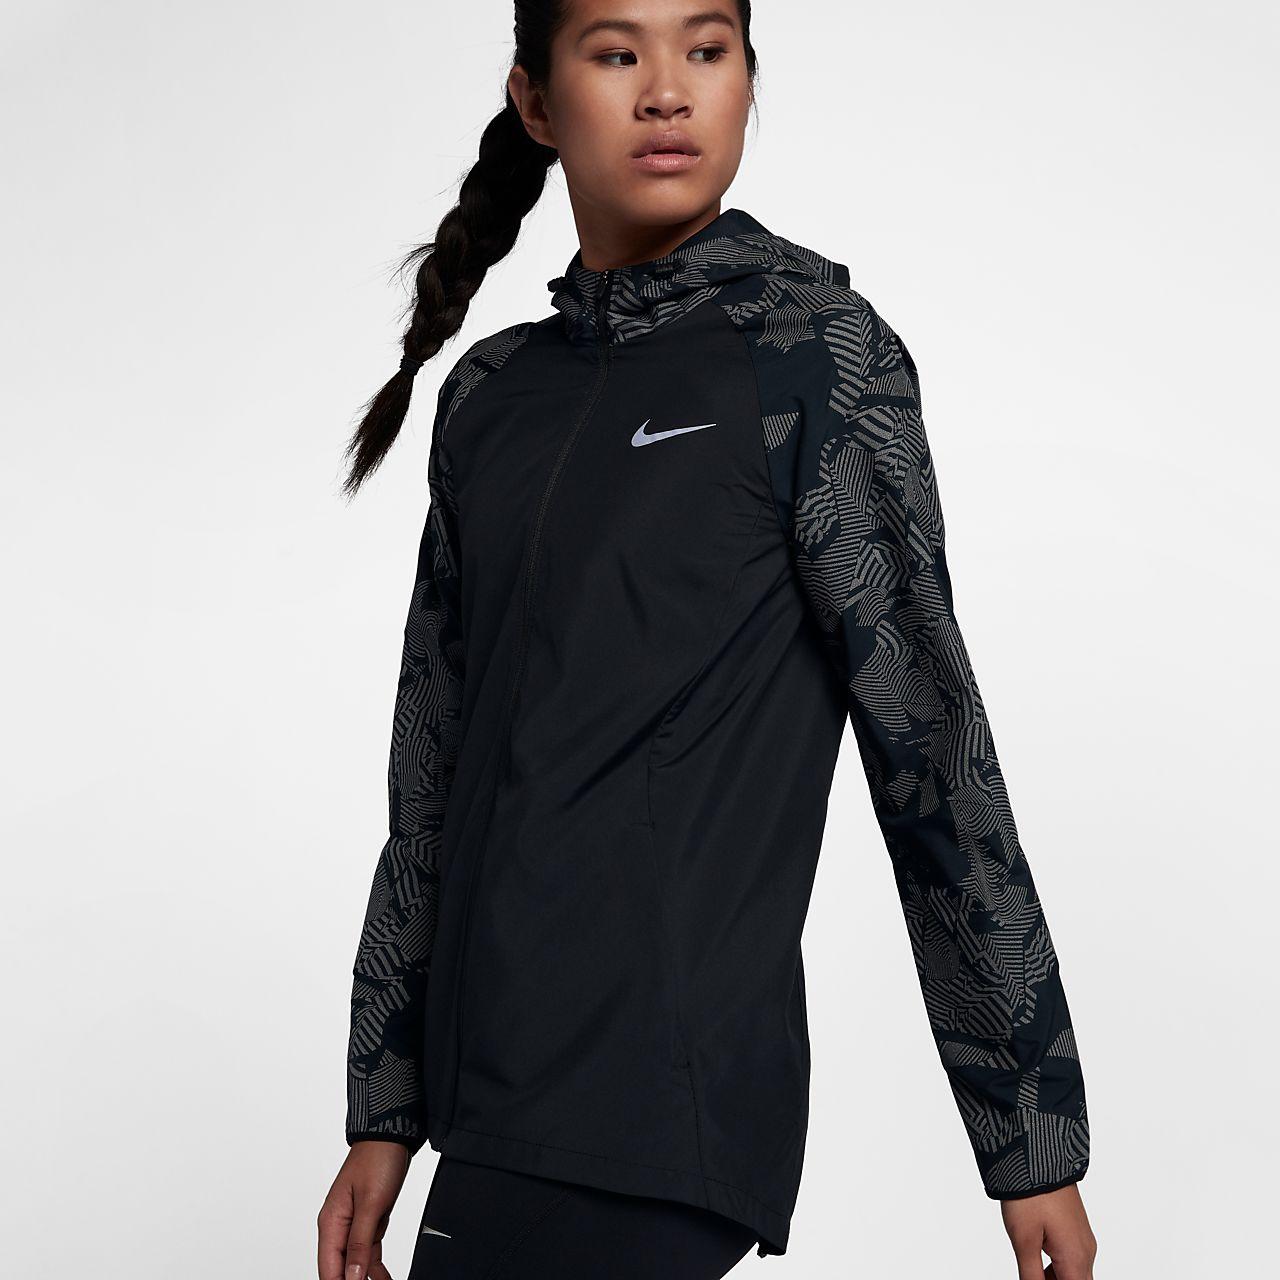 a3f620bbe1cc Nike Running Jacket Ladies unit4motors.co.uk